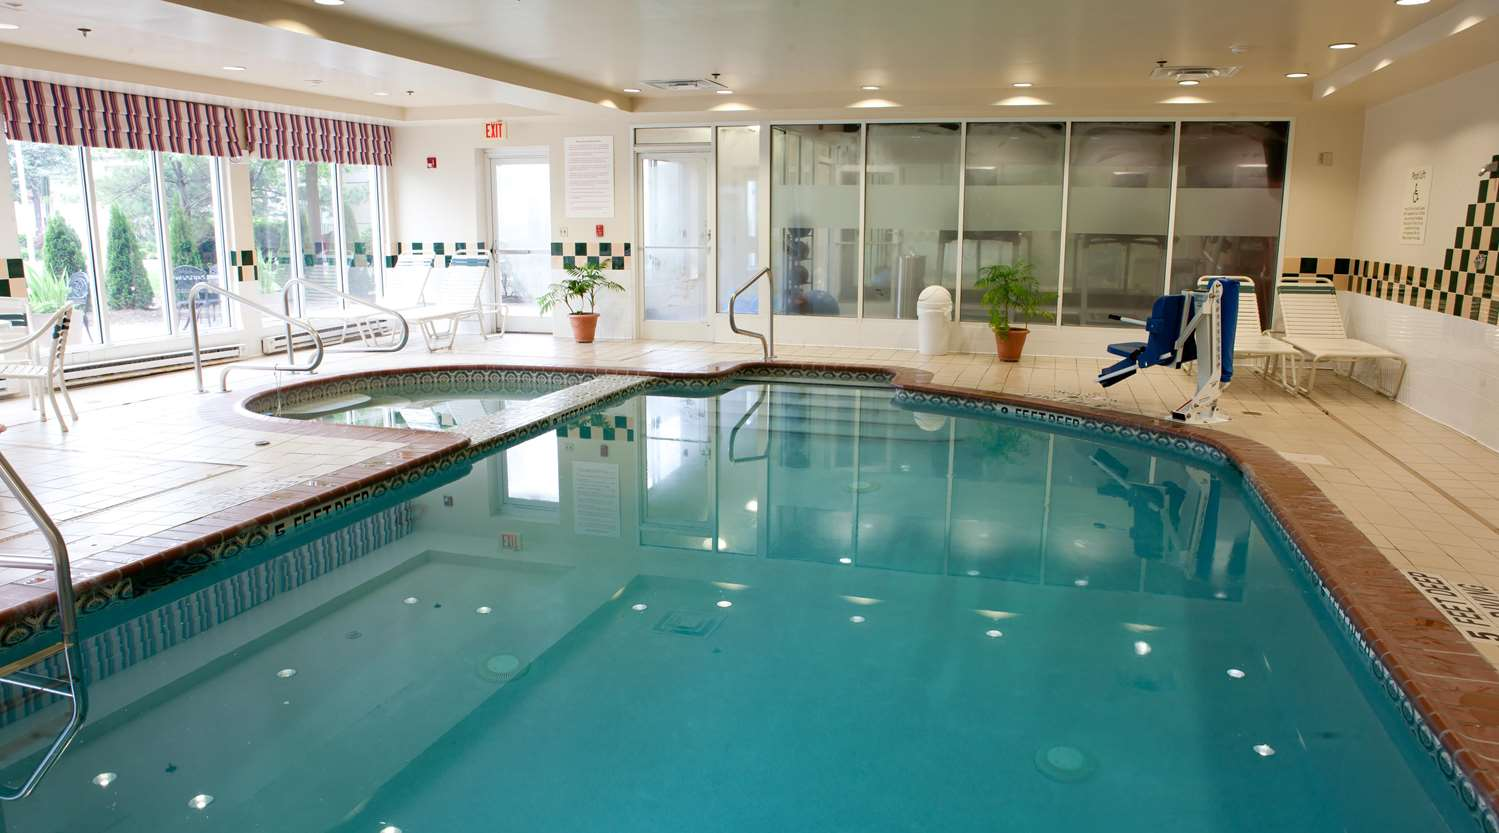 Pool - Hilton Garden Inn Meadowlands Secaucus